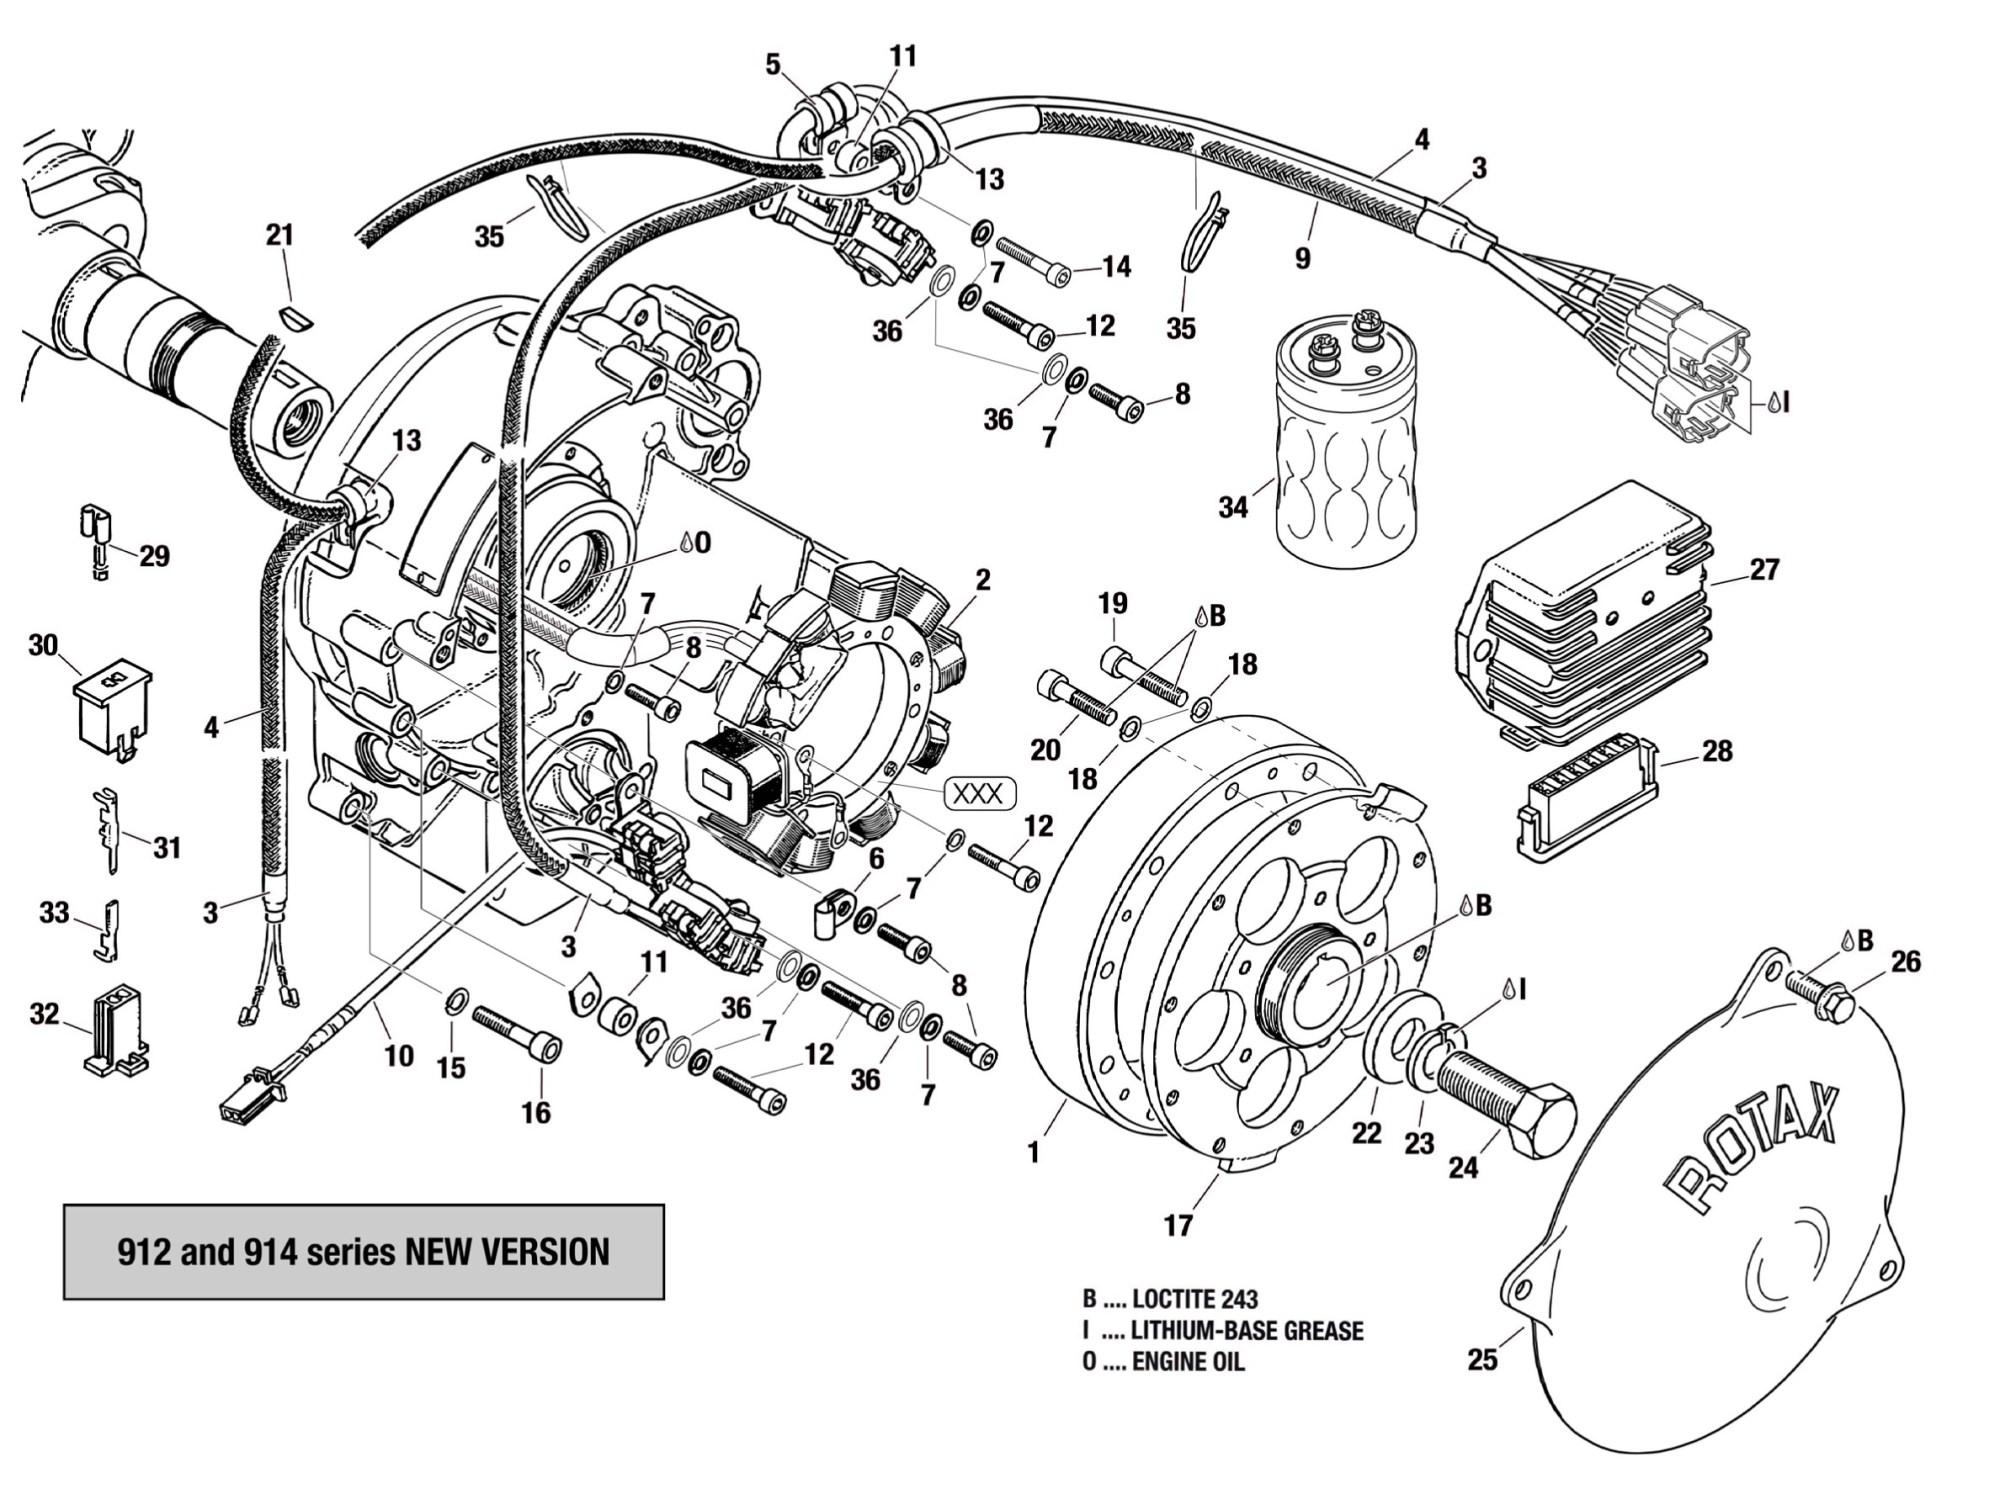 hight resolution of 912 u0026 914 series magneto ducati energia wiring diagram